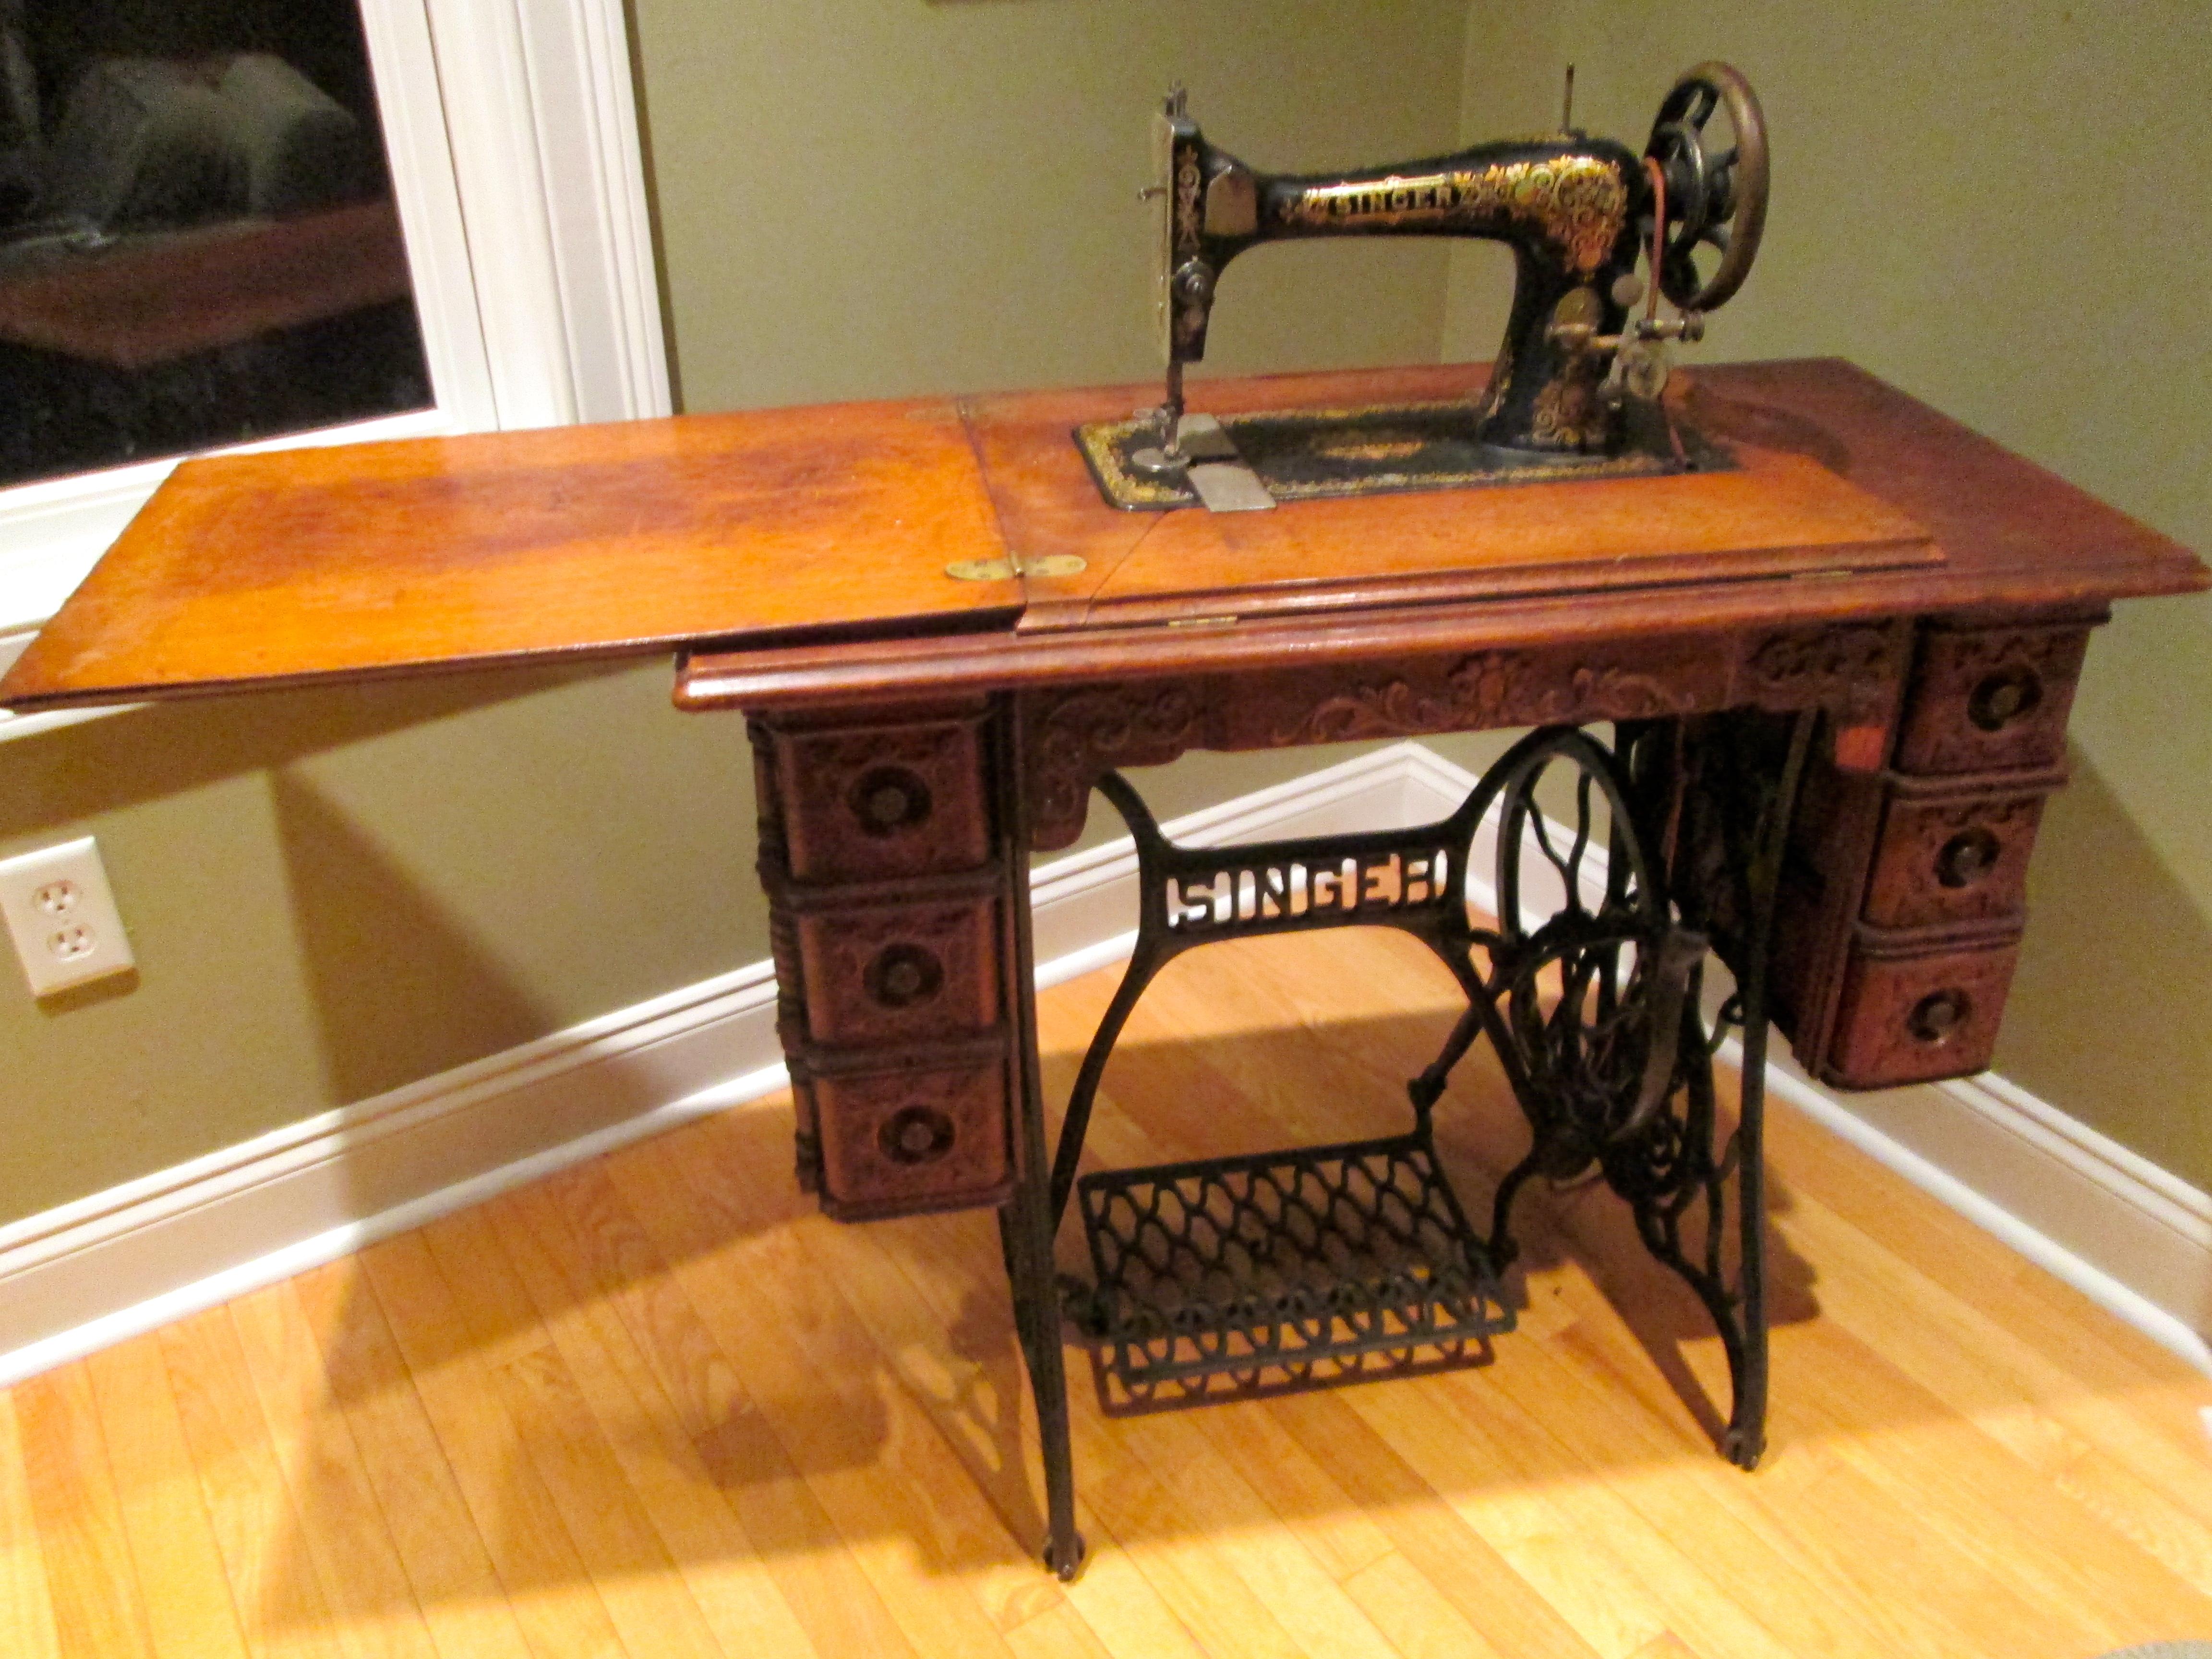 Vintage Singer Sewing Machine 1800s  miaprimacasa wordpress